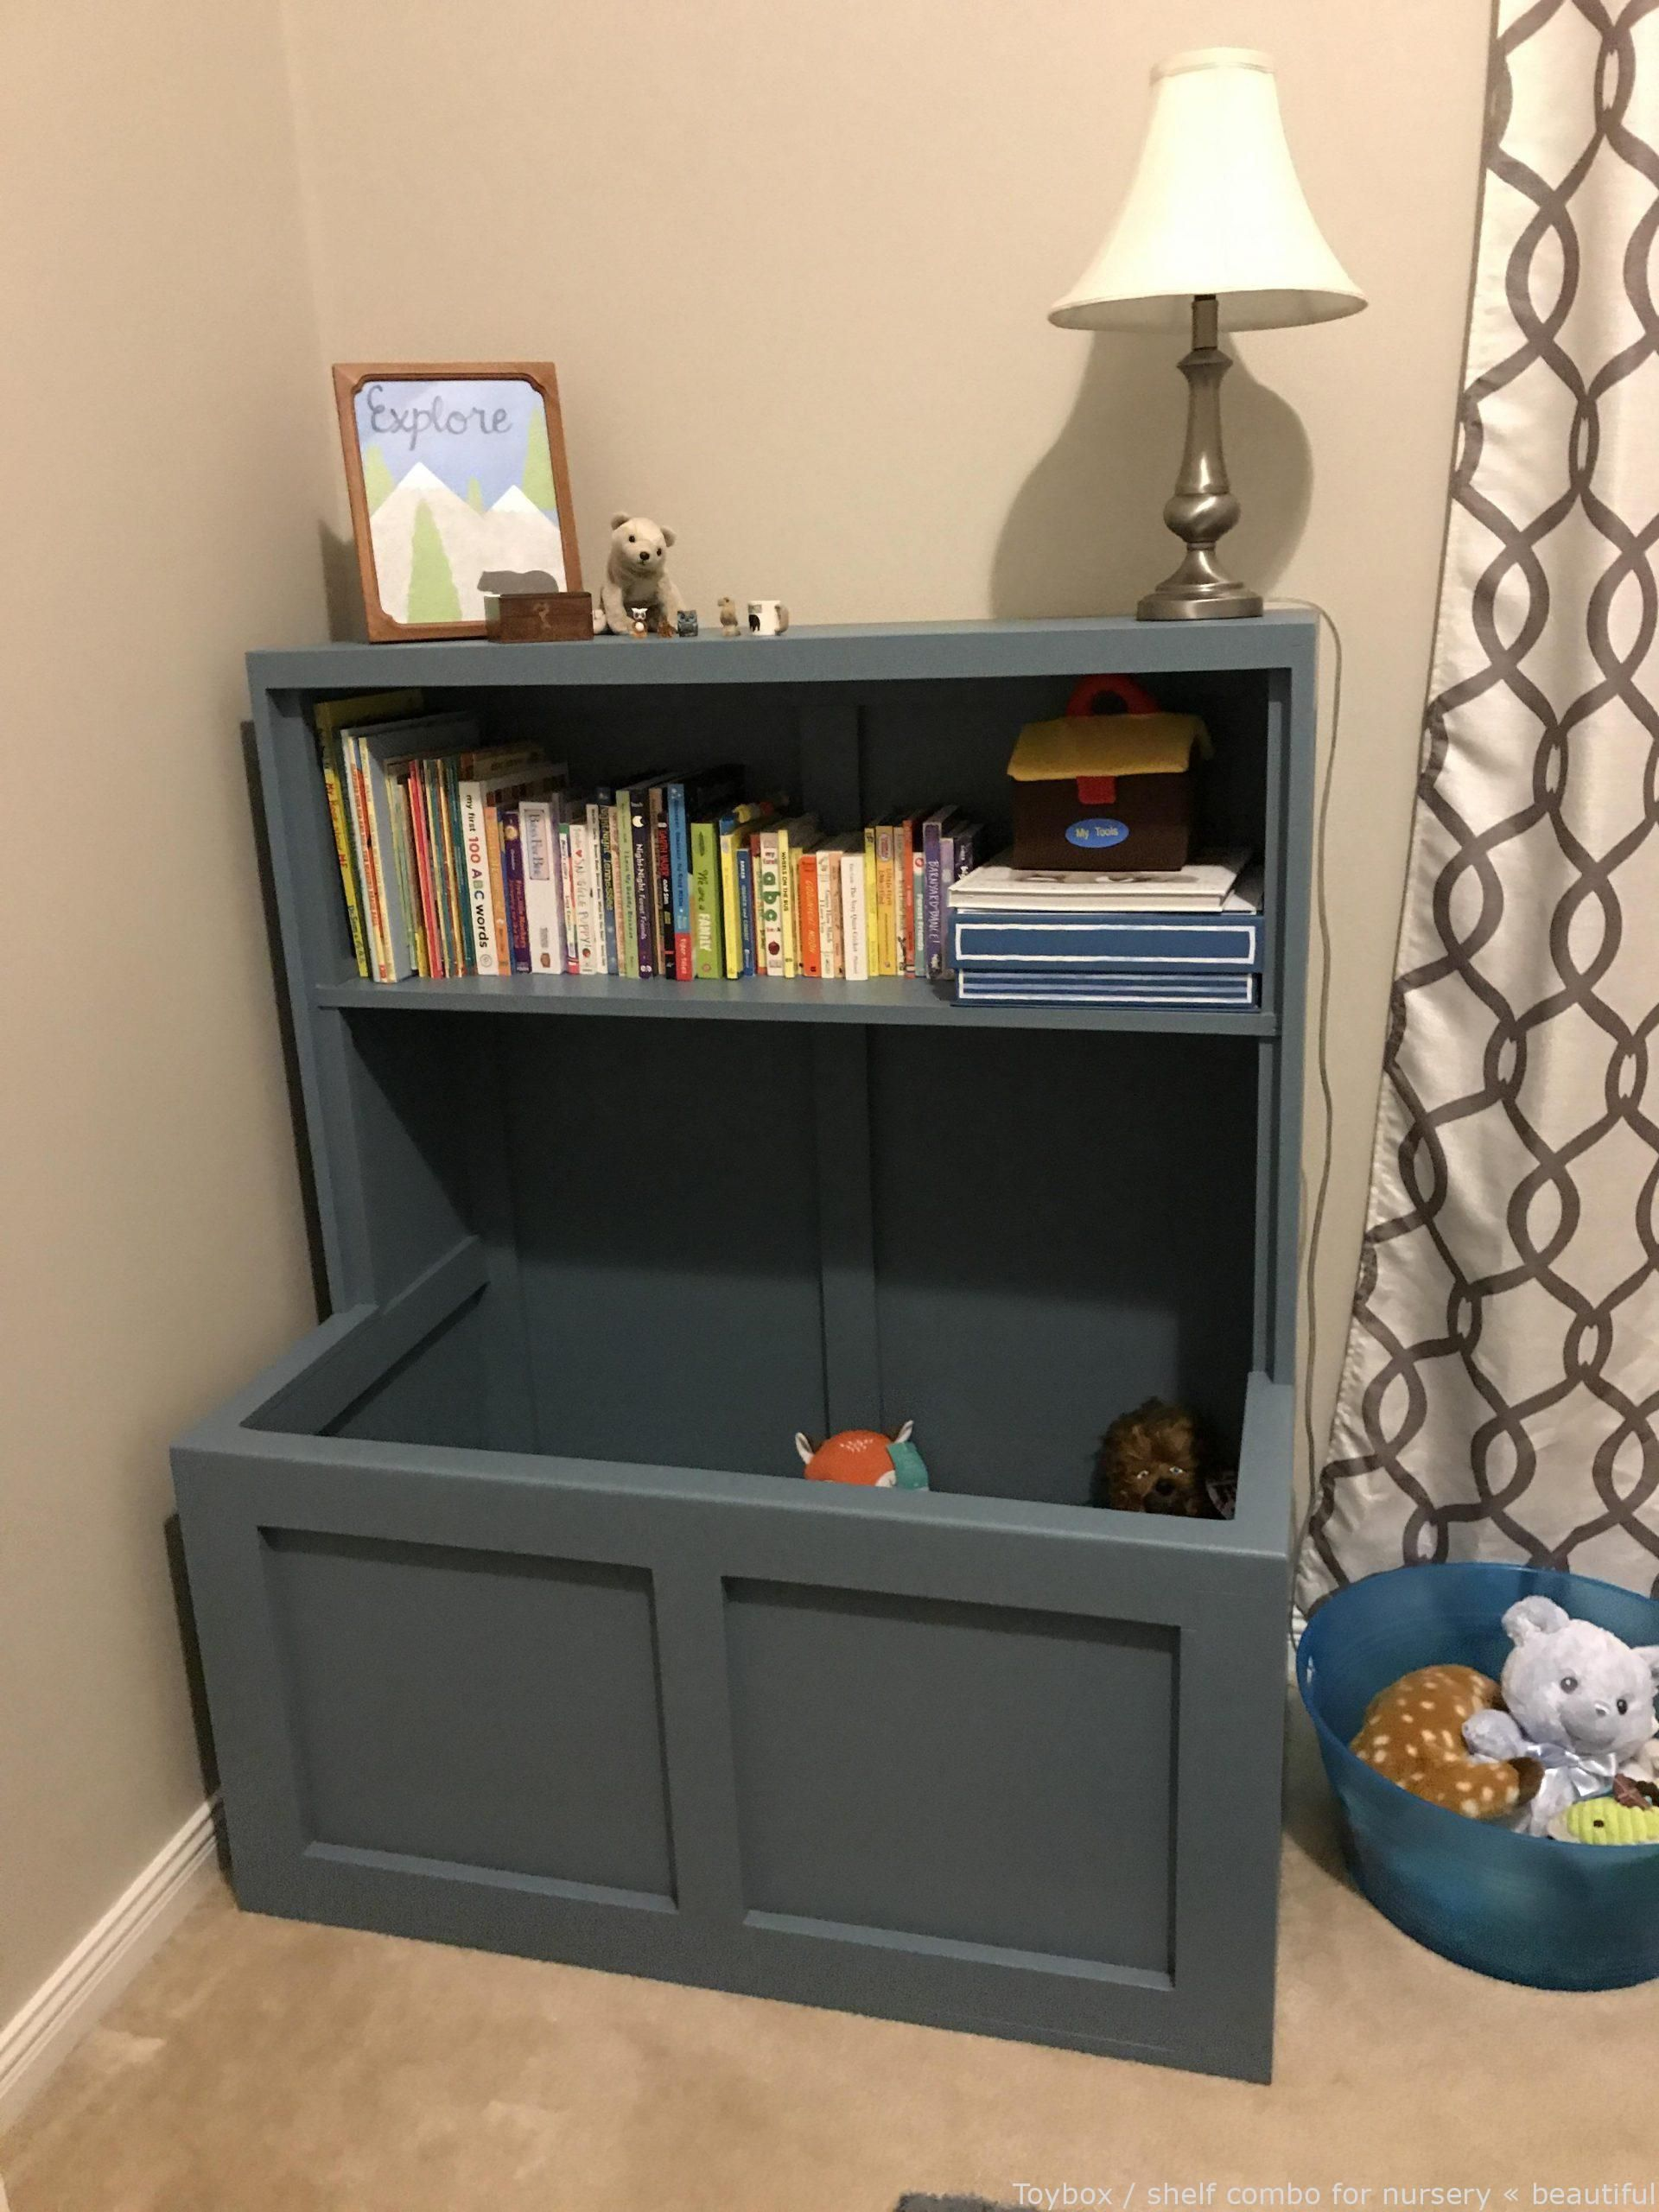 Diy Toybox Shelf Combo For Nursery Formidable Cool Diys Diy Design Diy Urban Dyi Home Improvement In 2020 Toy Boxes Shelves Nursery Shelves